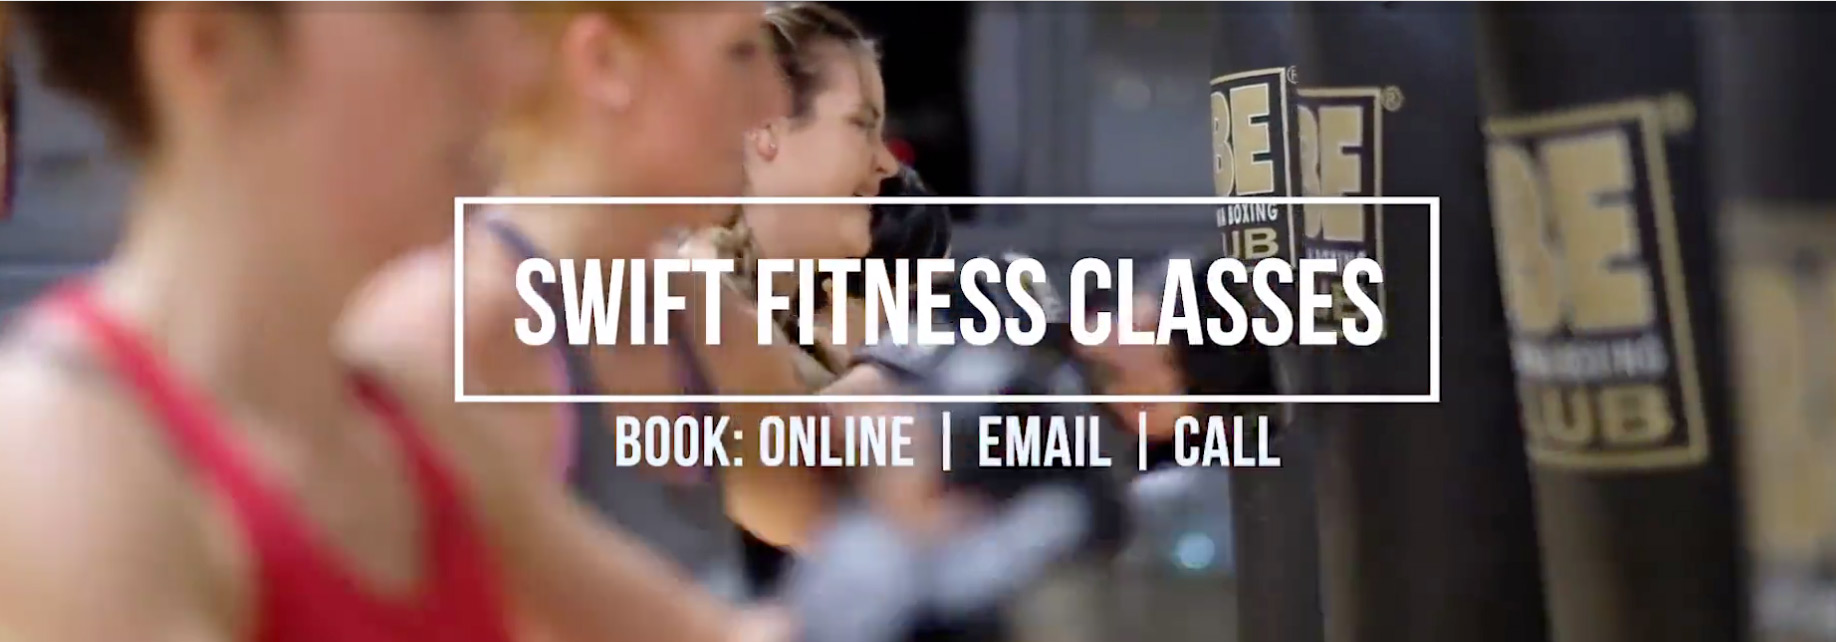 gym-classes-in-york 1836 x 642